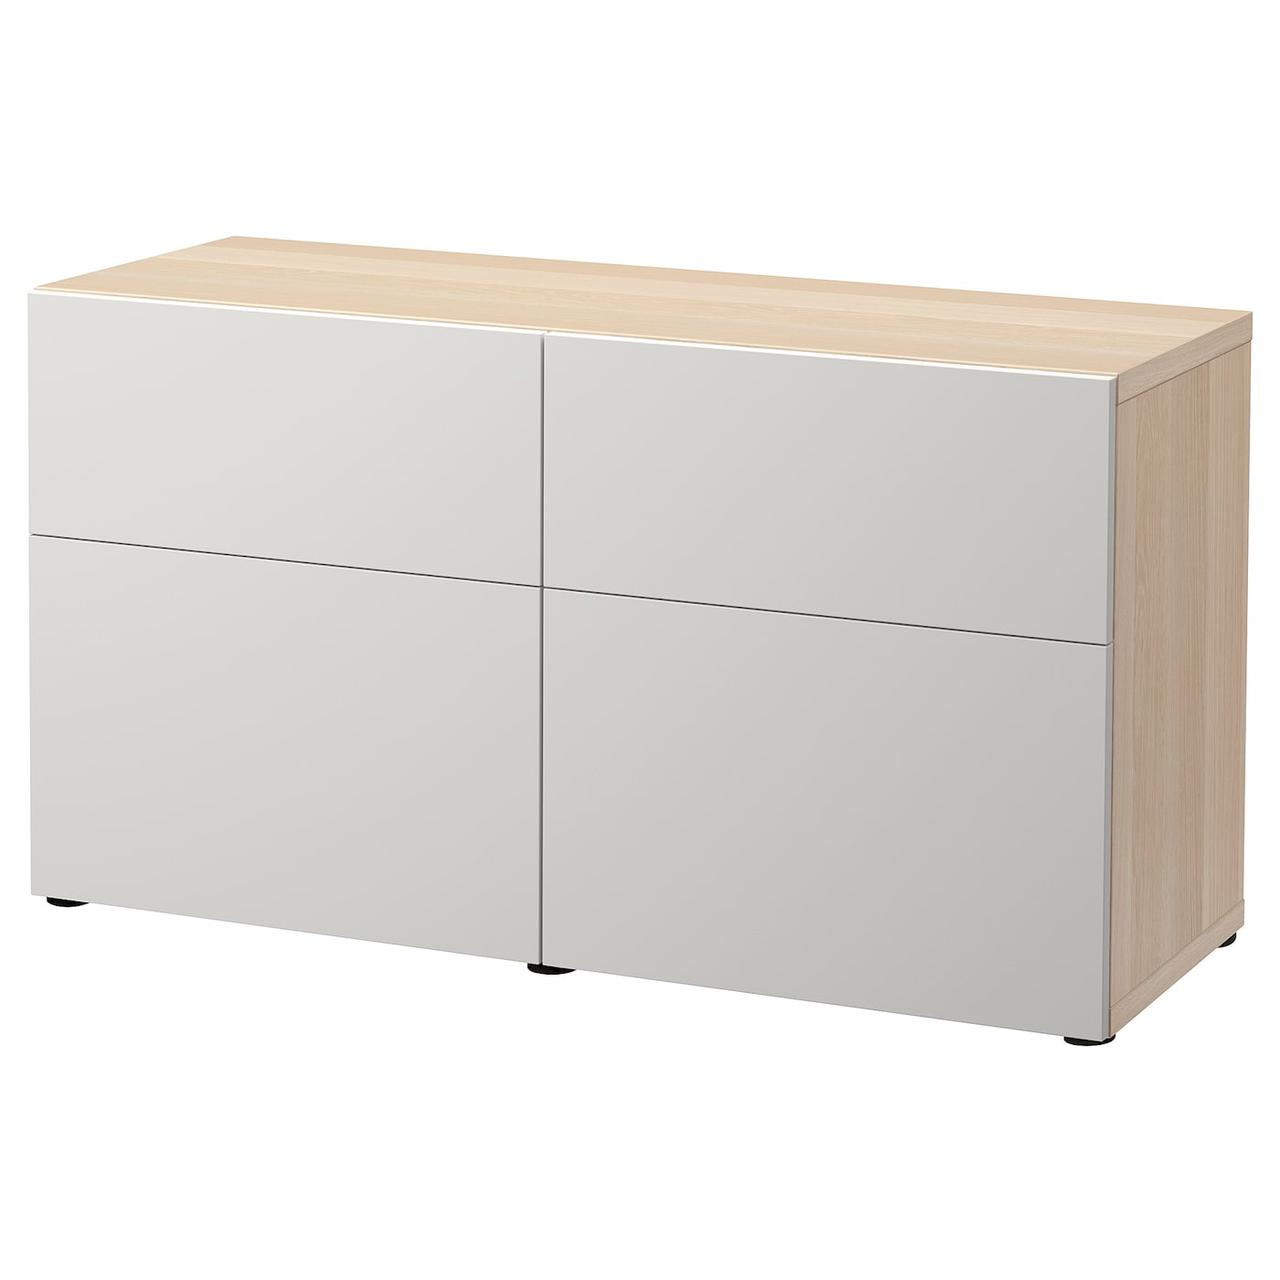 IKEA BESTA Тумба под телевизор 120x42x65 cm (793.246.38)